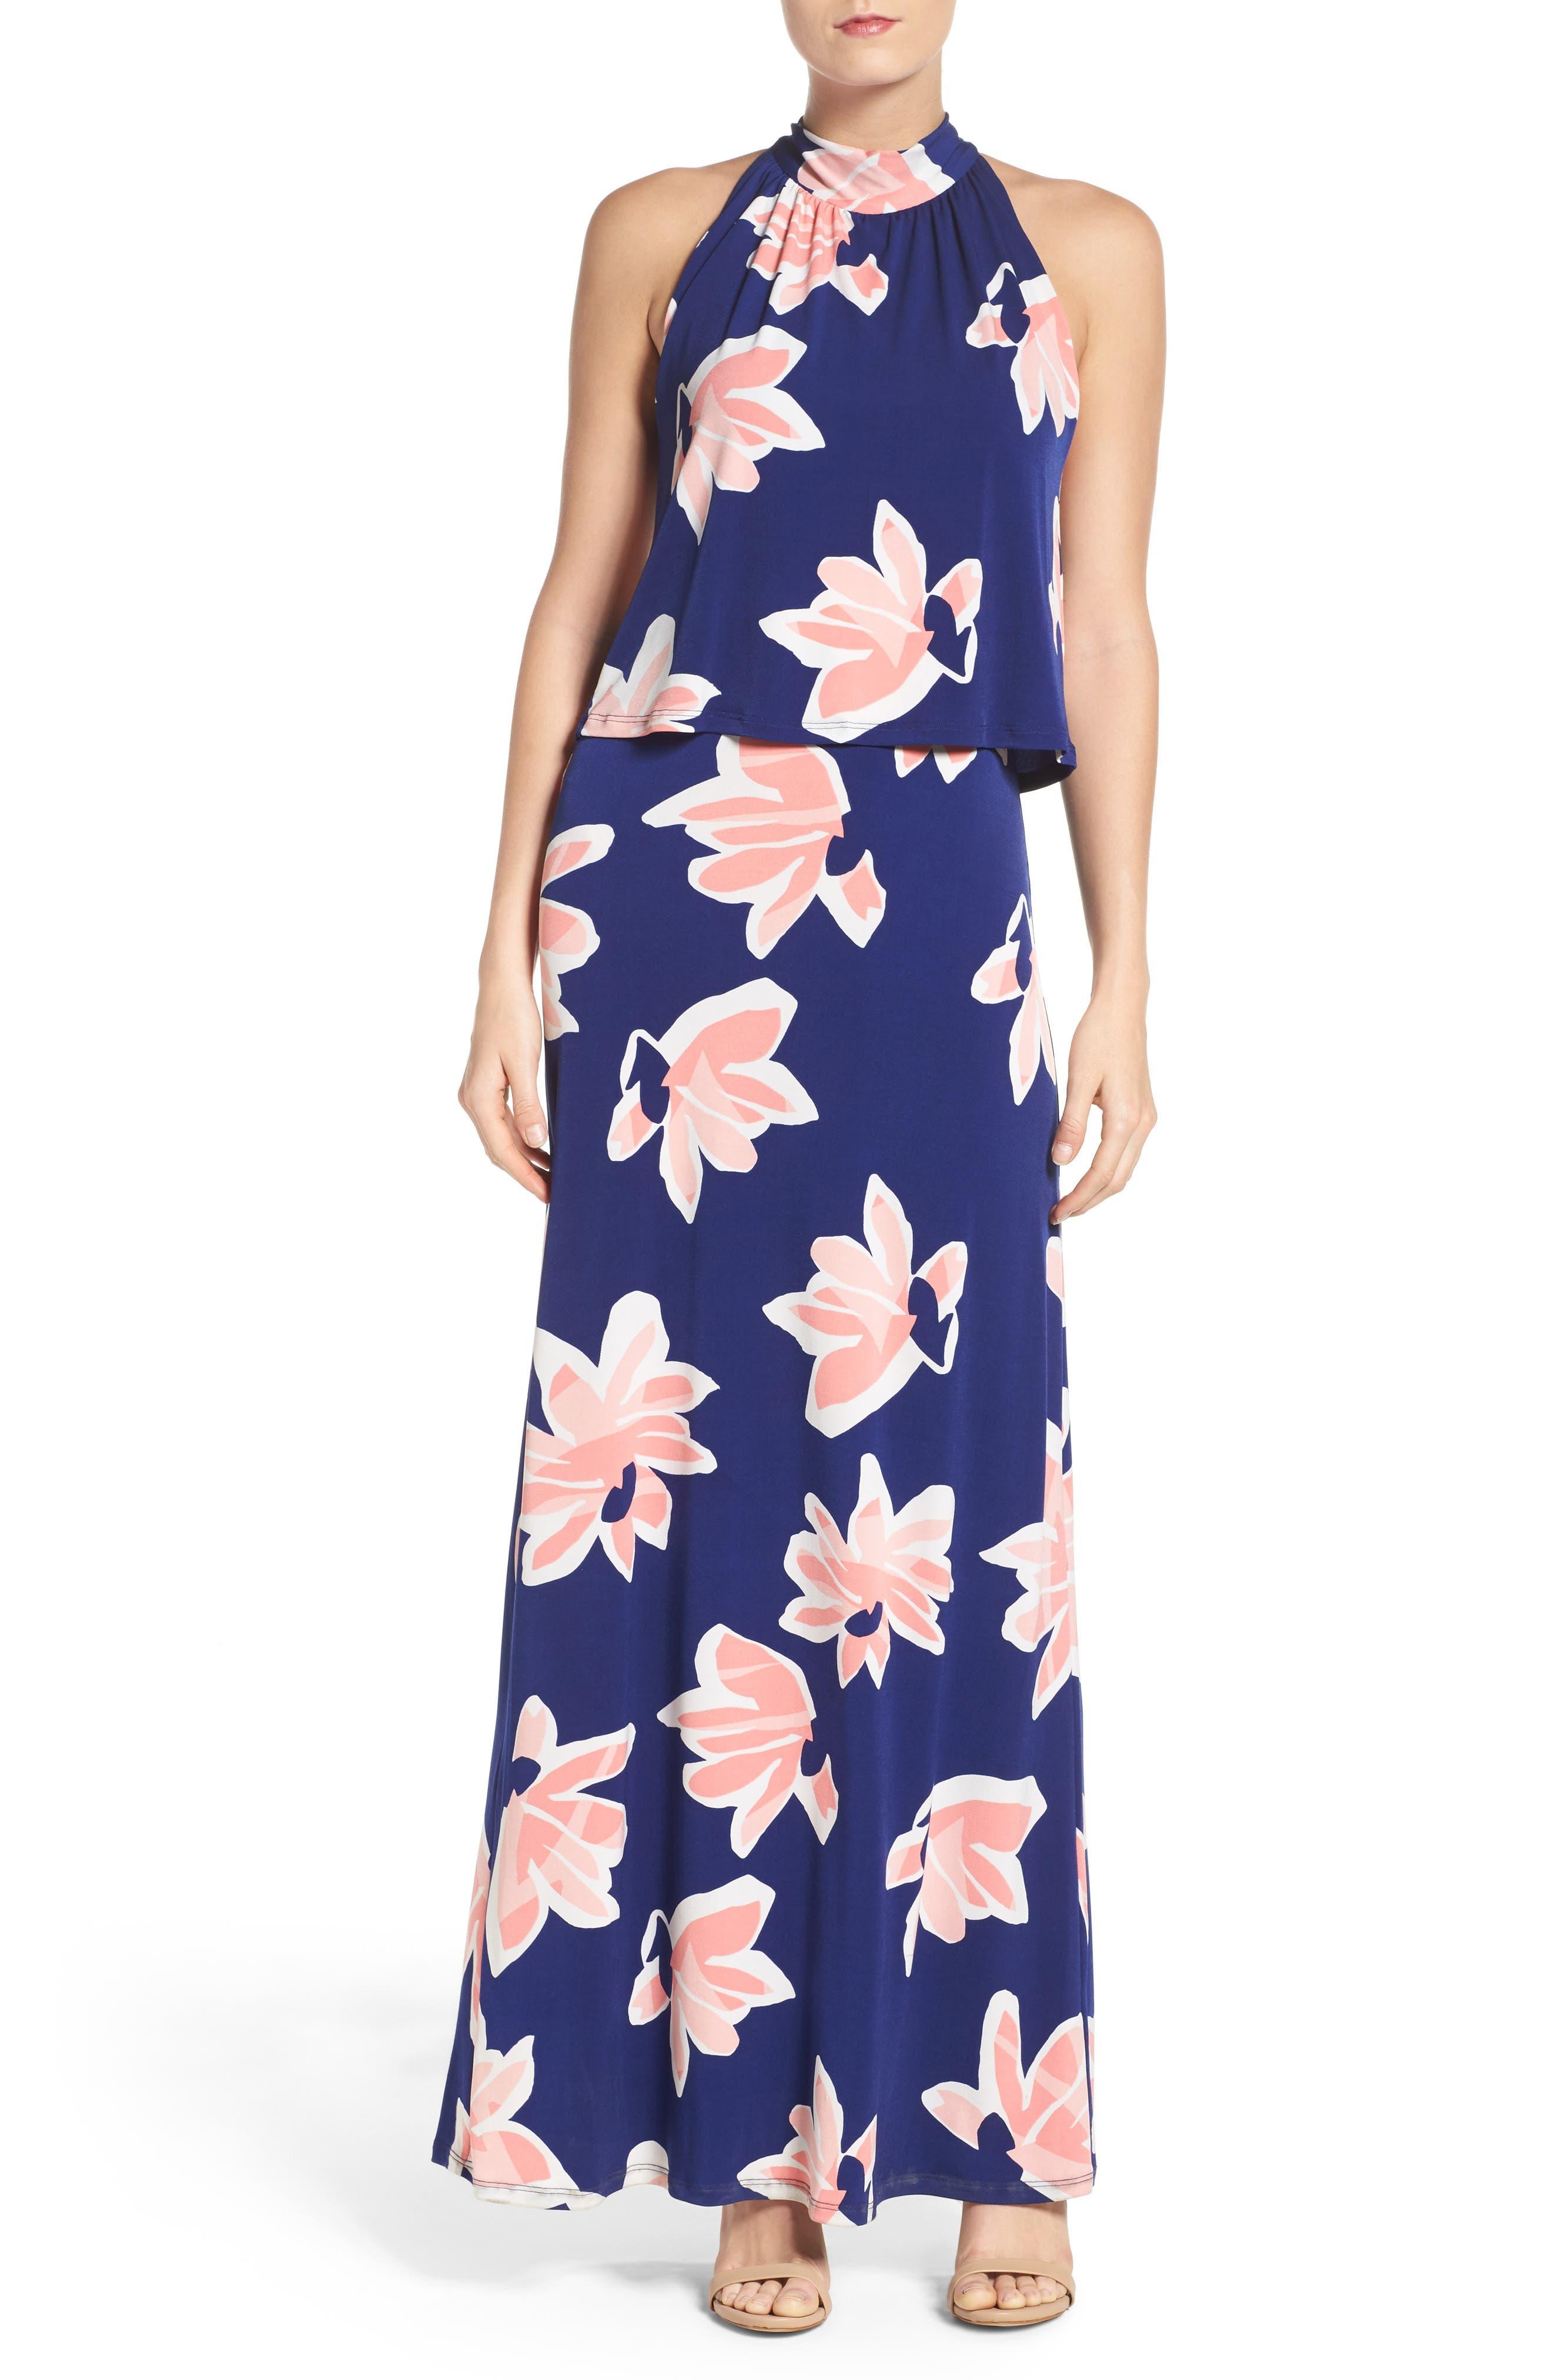 Leota 'Syler' Popover Jersey Maxi Dress